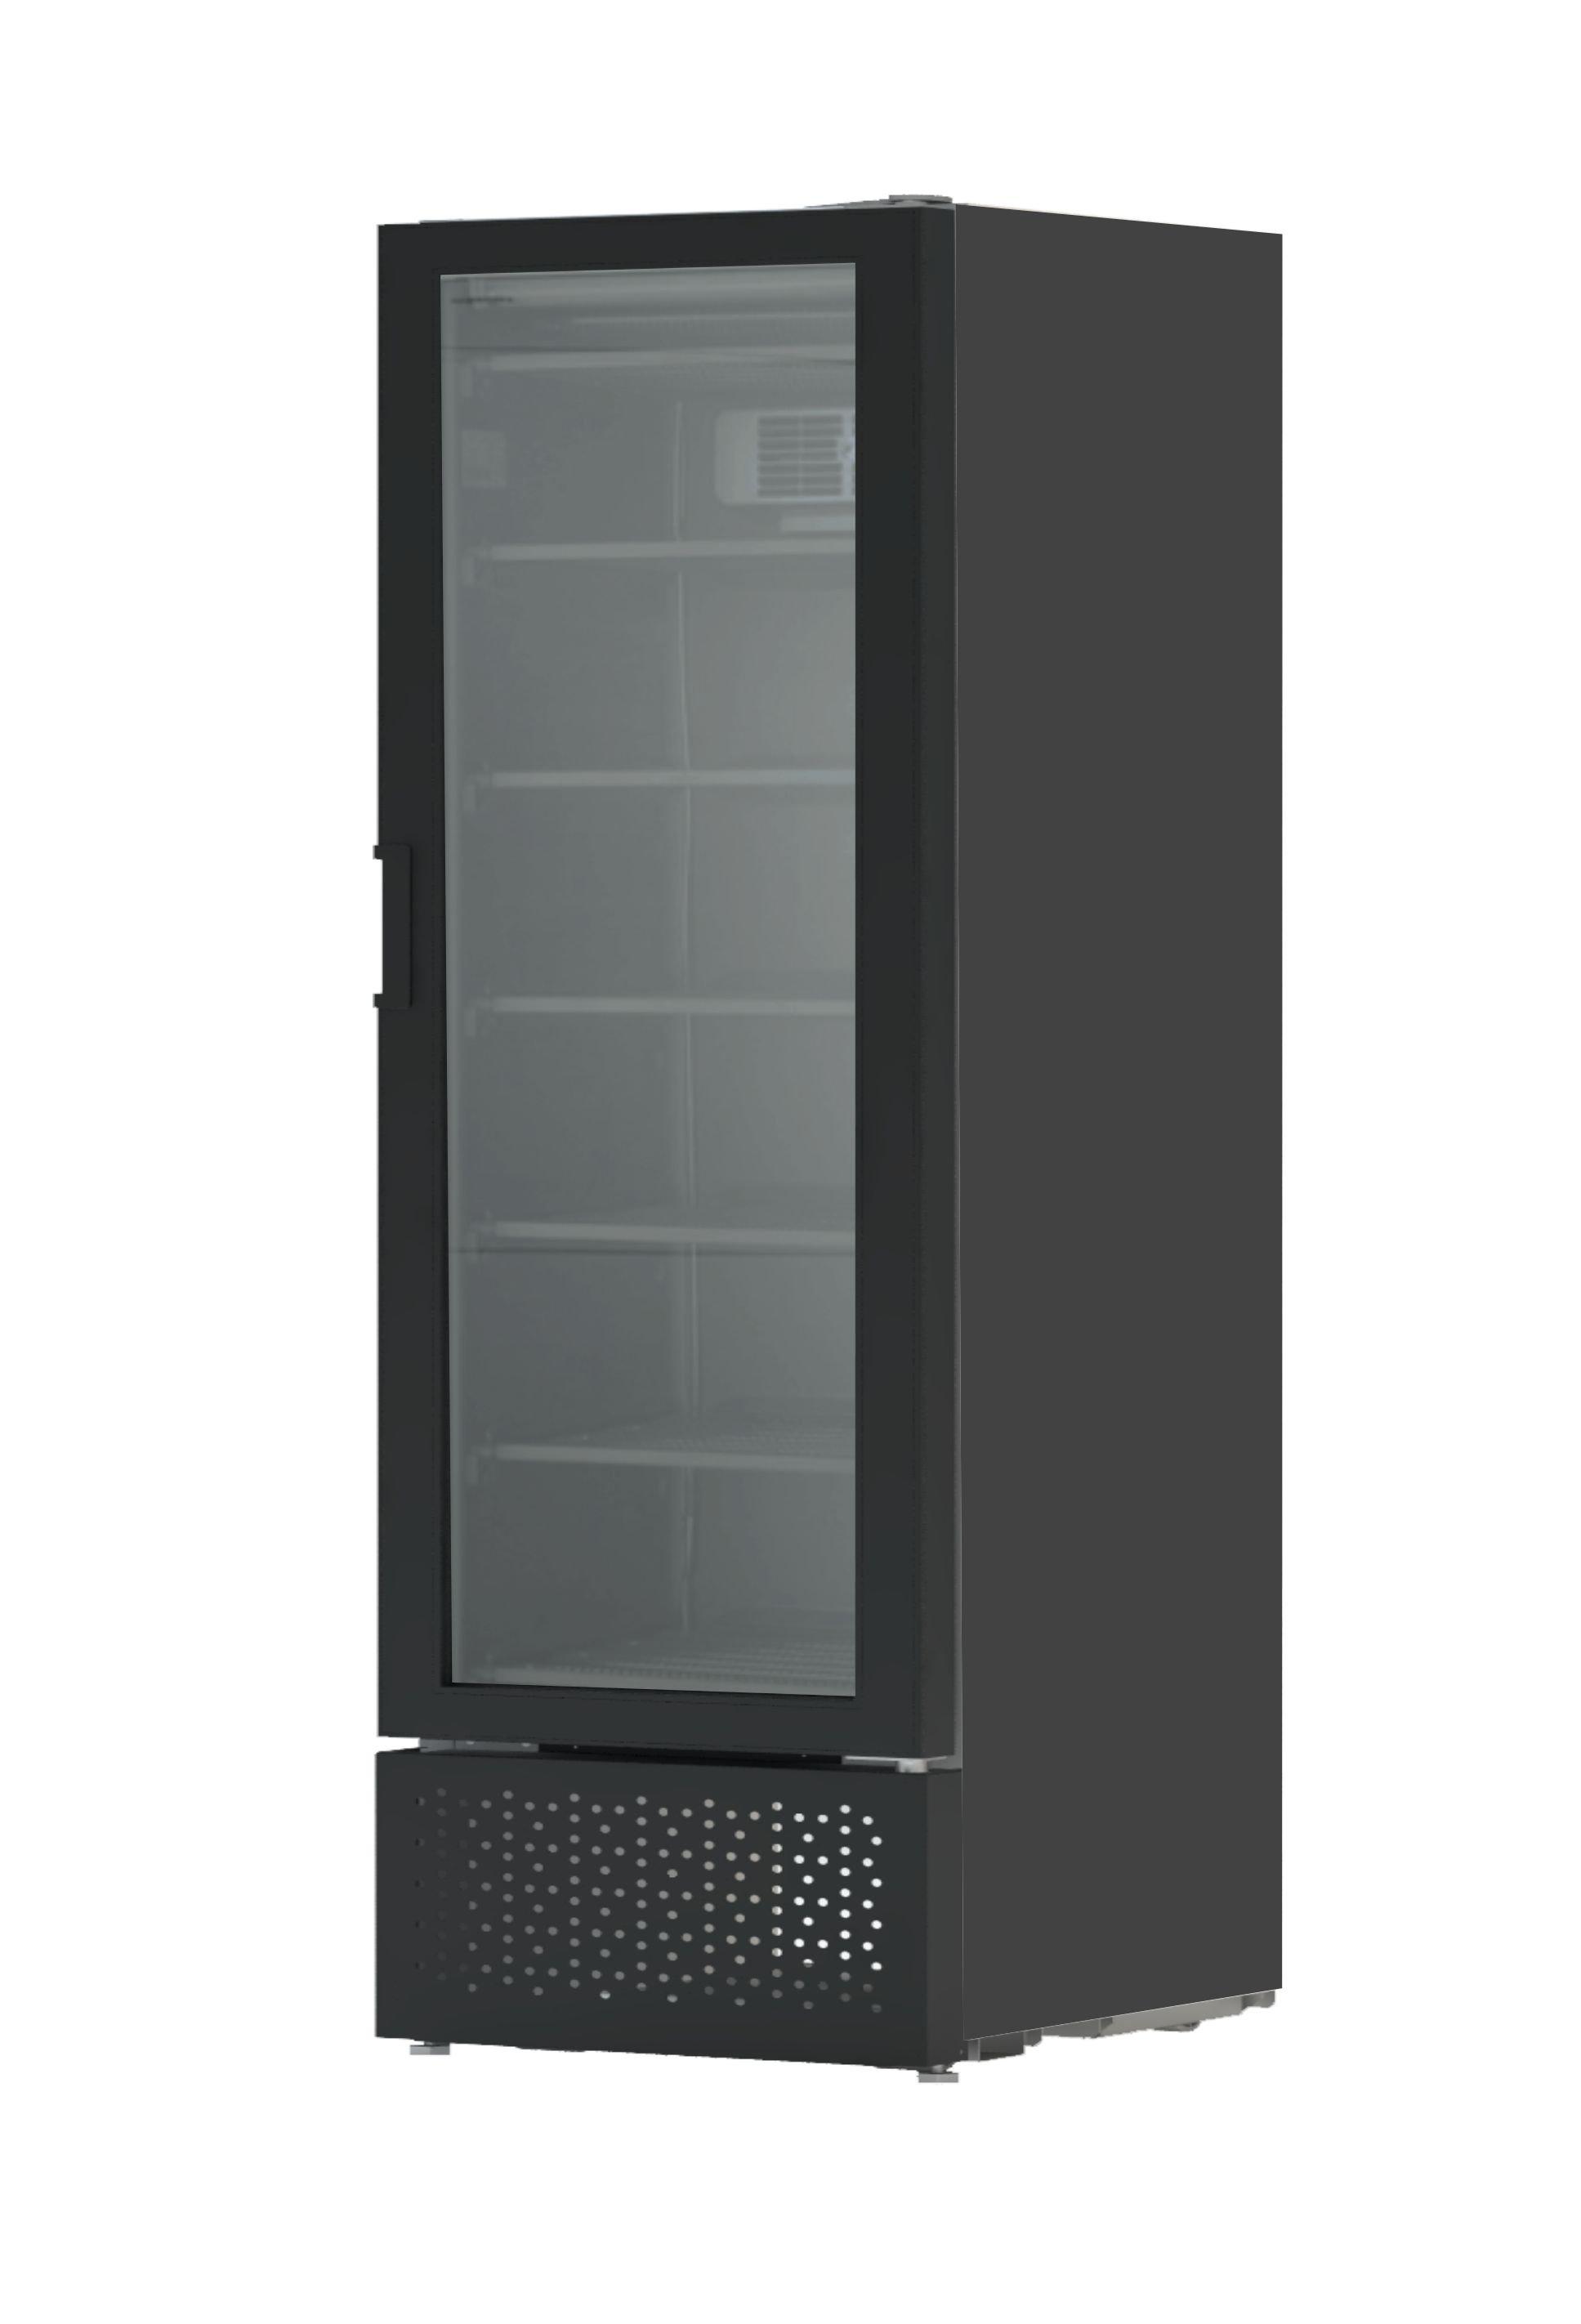 senox-ssc-900